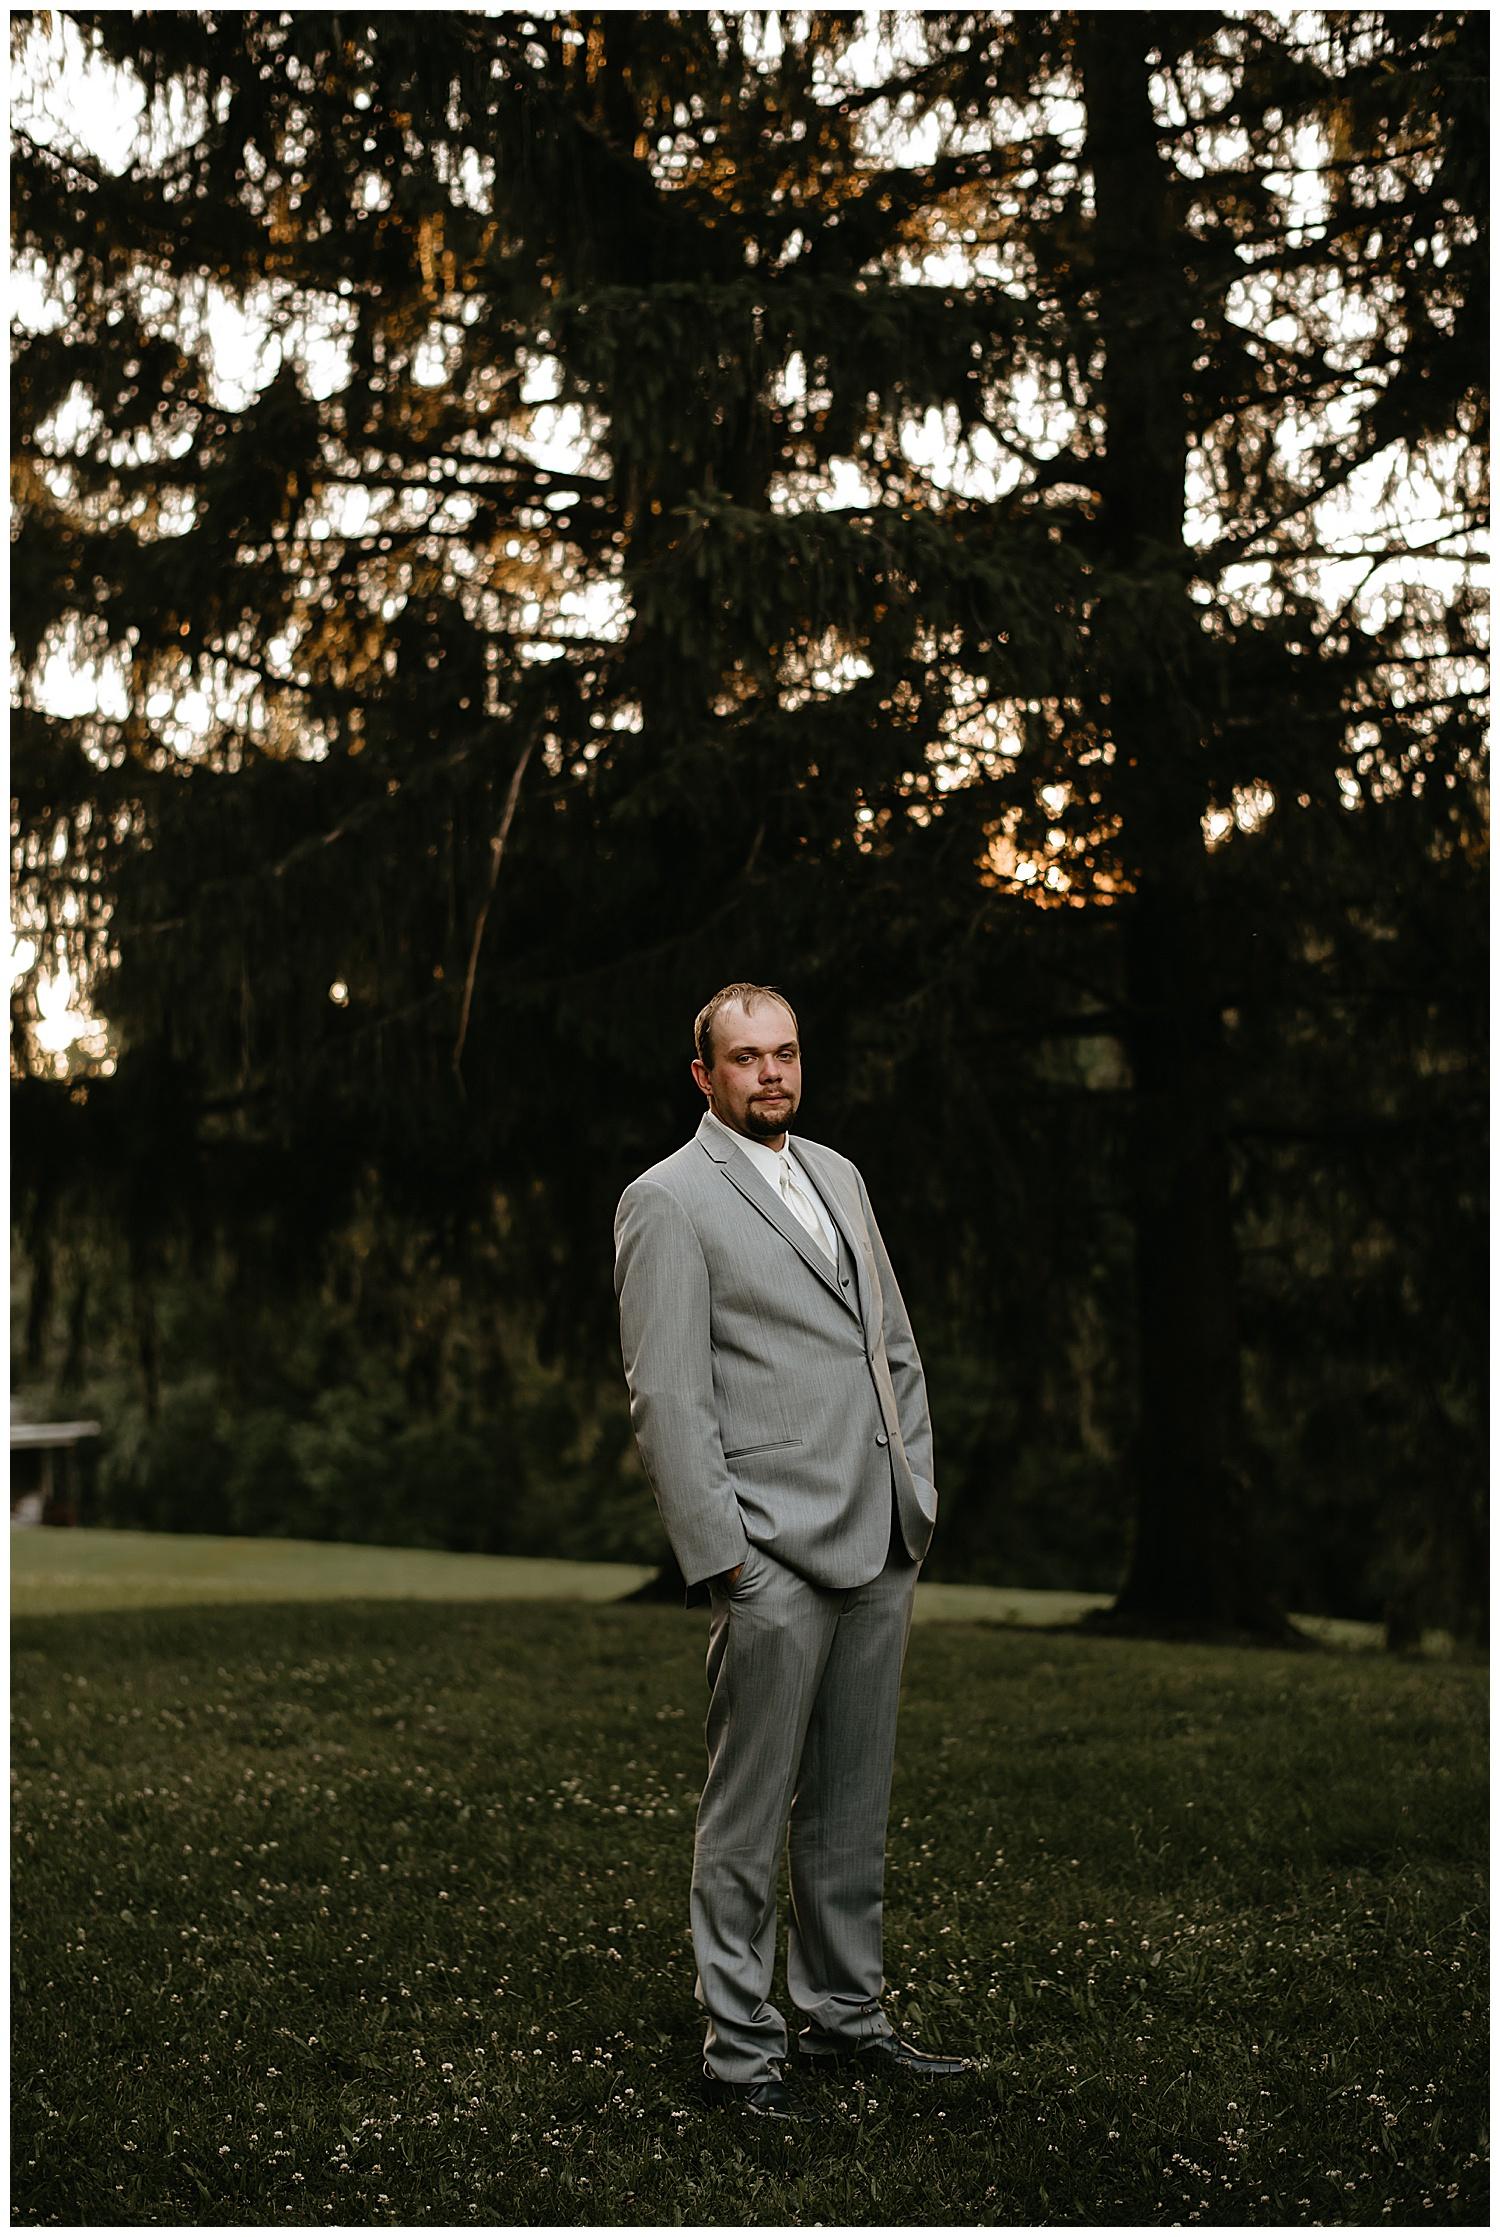 NEPA-Lehigh-Valley-Wedding-Photographer-at-Fountain-Springs-Country-Inn-Ashland-PA_0066.jpg